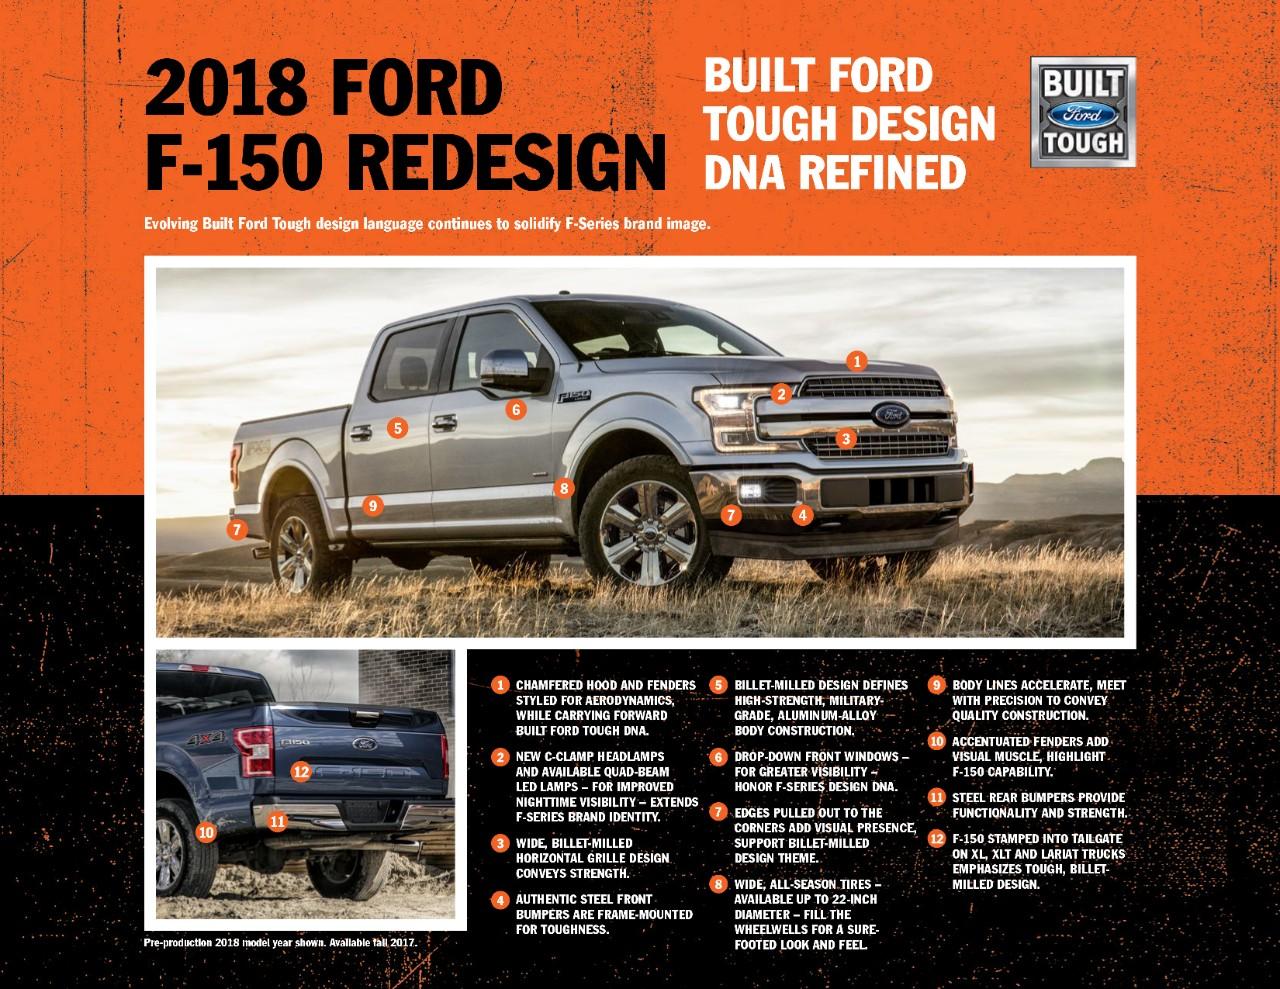 2018 ford f 150 design emphasizes proven strengths the news wheel. Black Bedroom Furniture Sets. Home Design Ideas